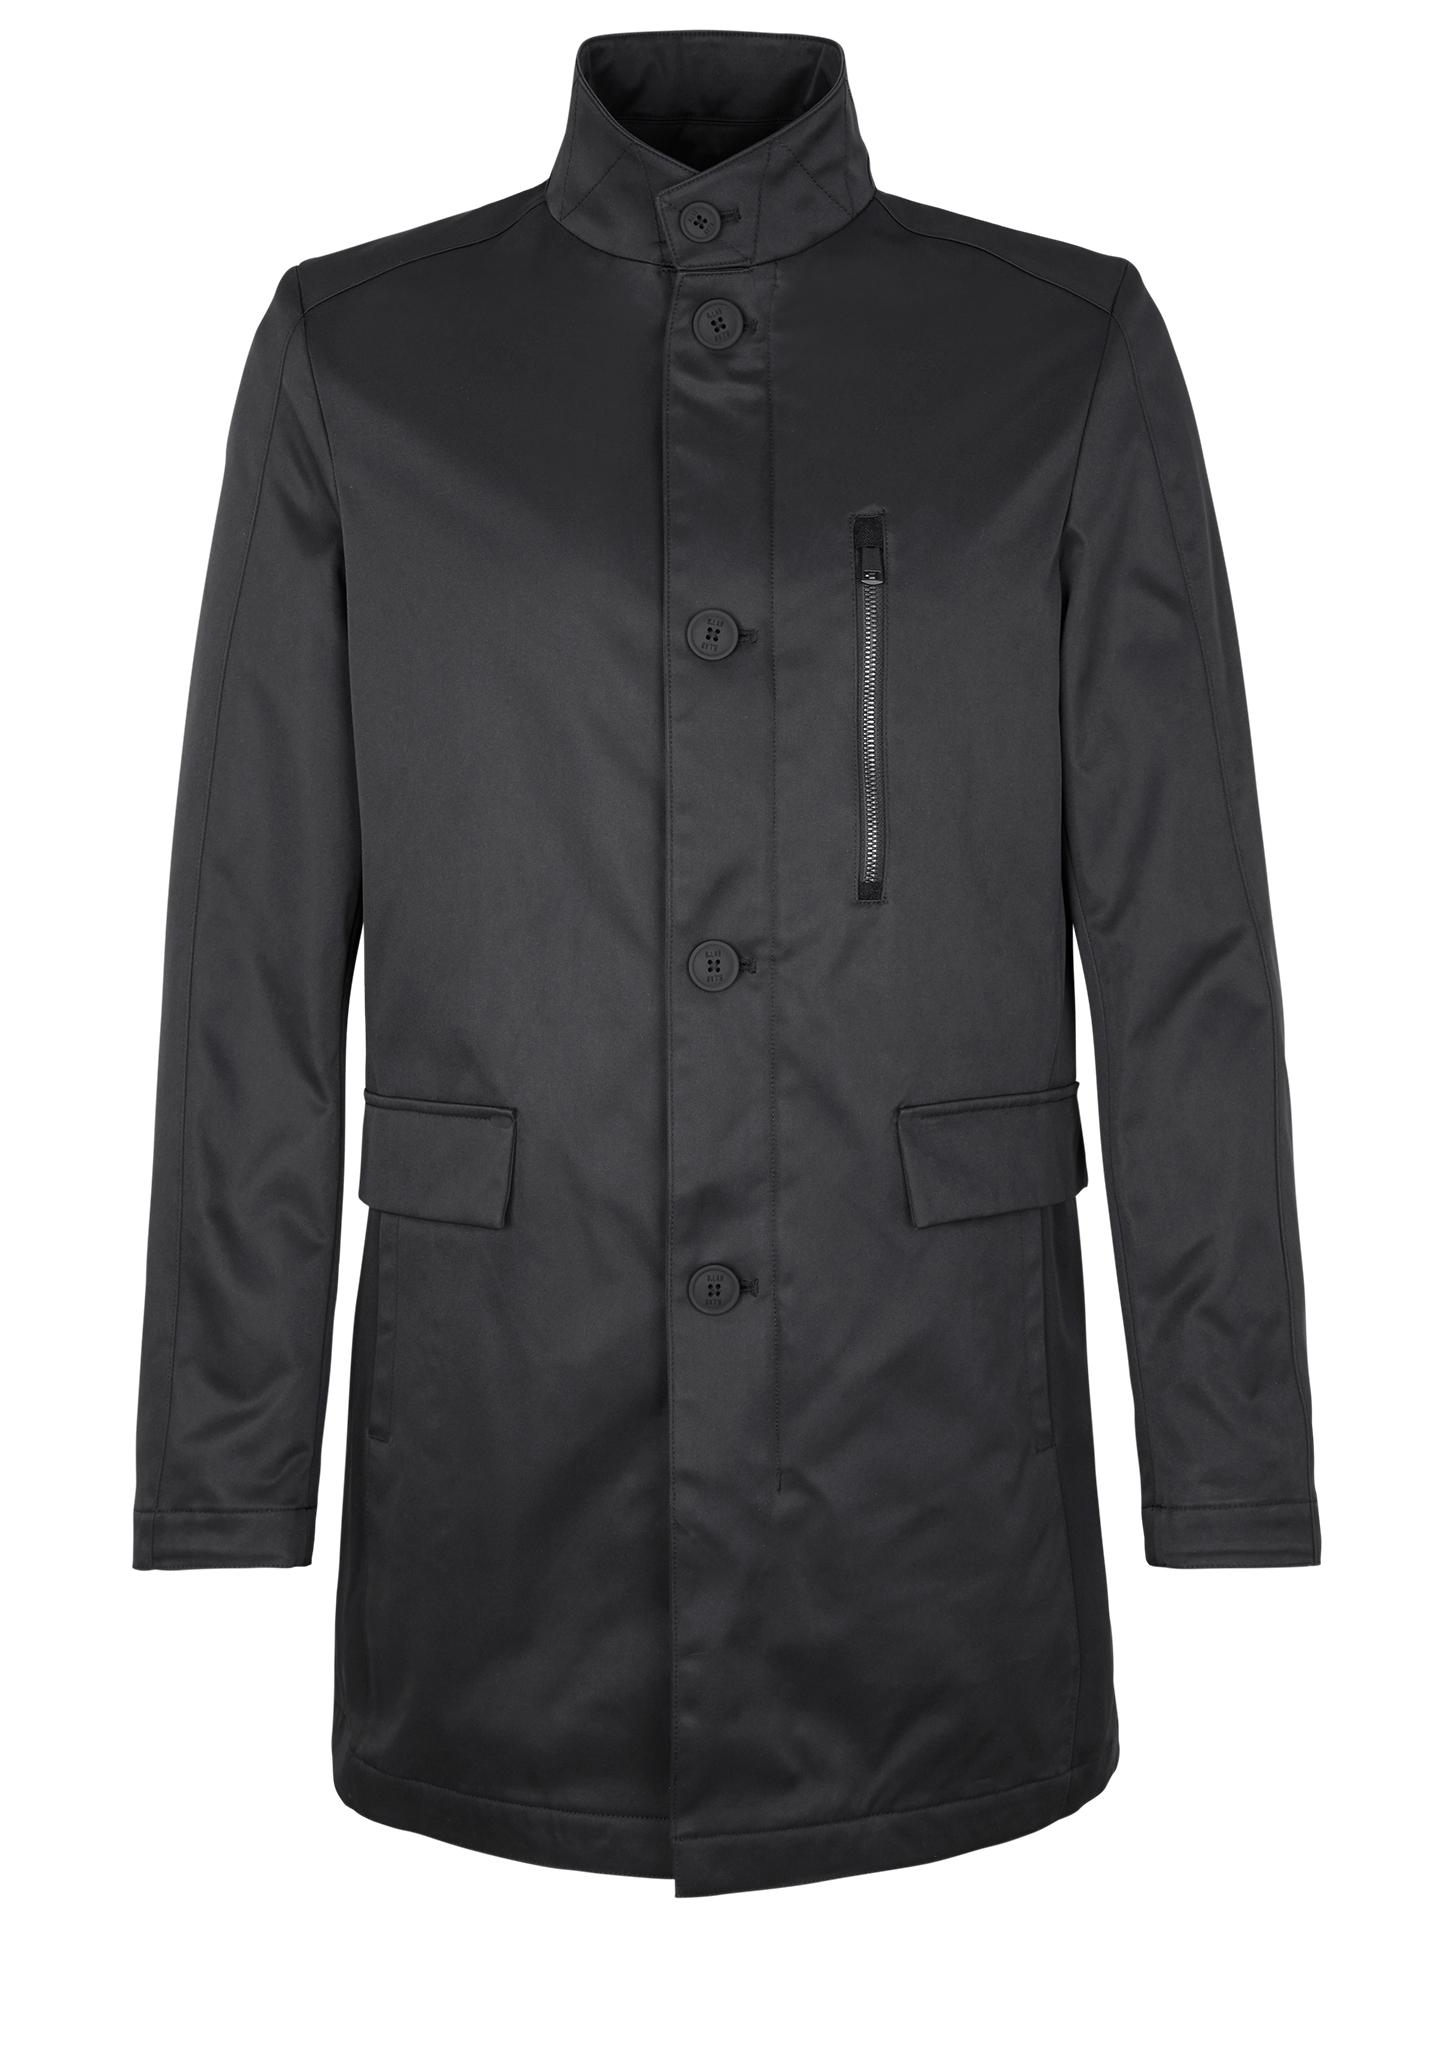 Kurzmantel | Bekleidung > Mäntel | Grau | Obermaterial 100% polyester| futter 100% polyester| füllmaterial 100% polyester | s.Oliver BLACK LABEL